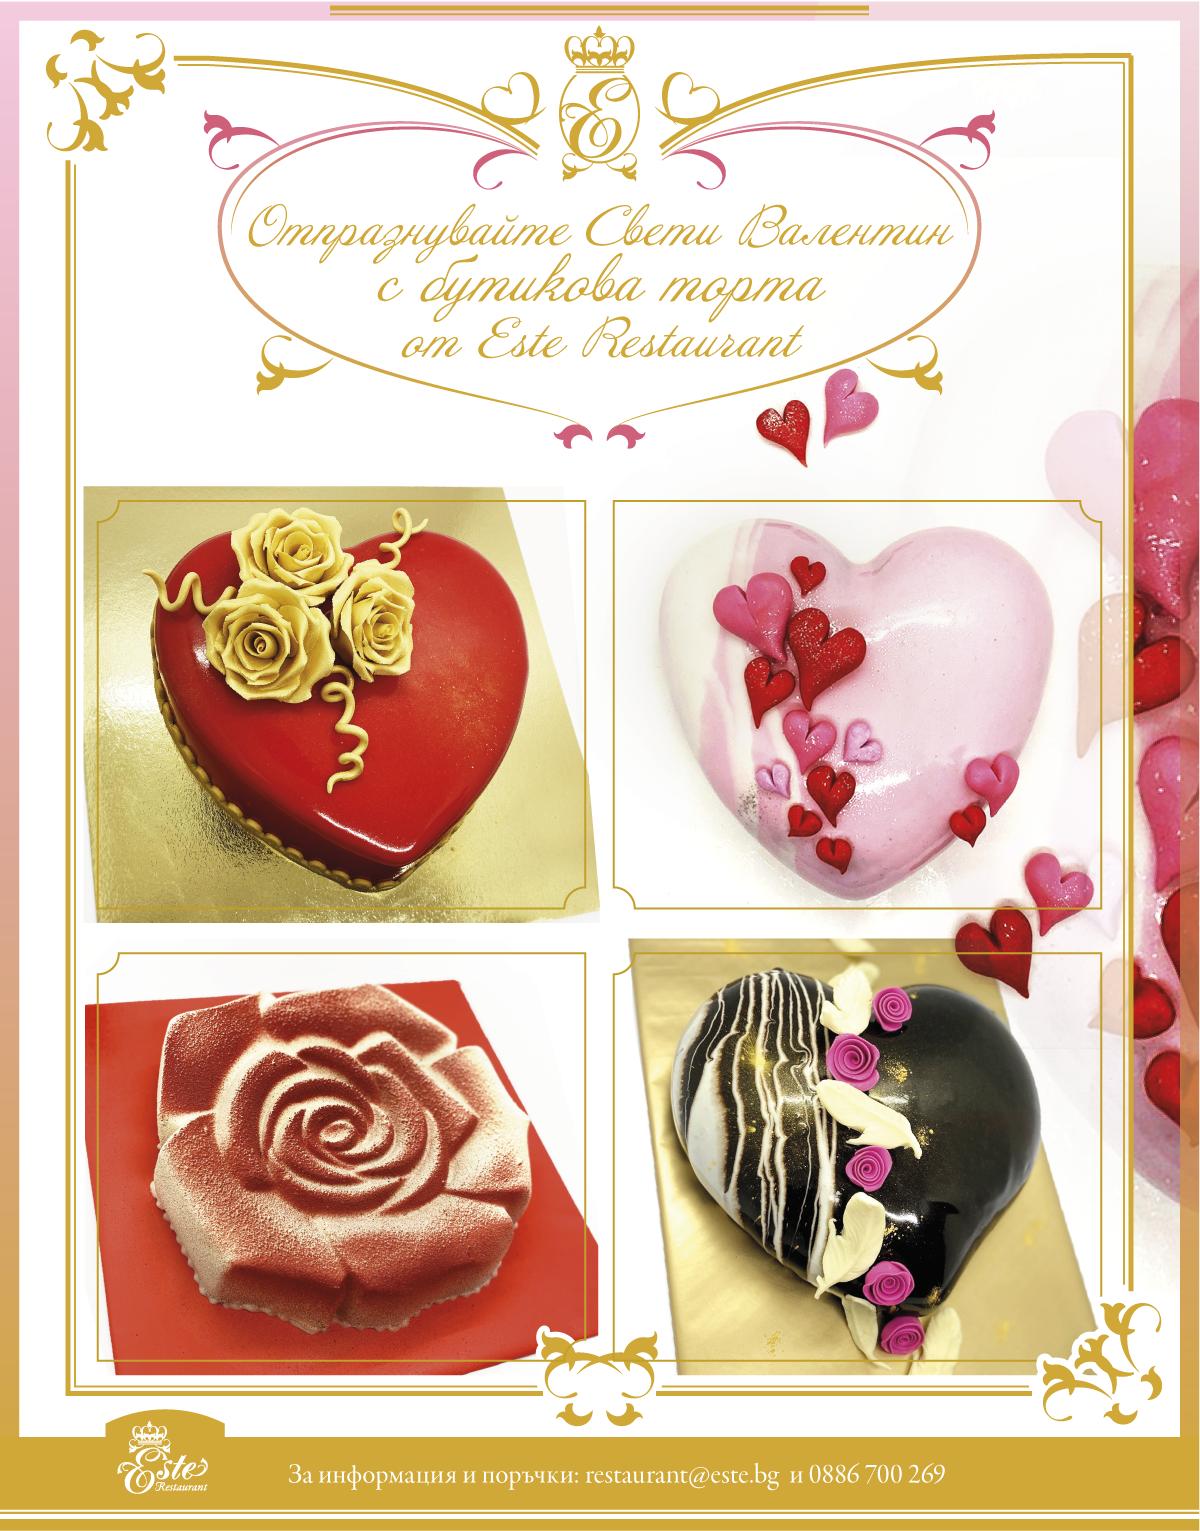 Отпразнувайте Свети Валентин с бутикова торта от Este Restaurant